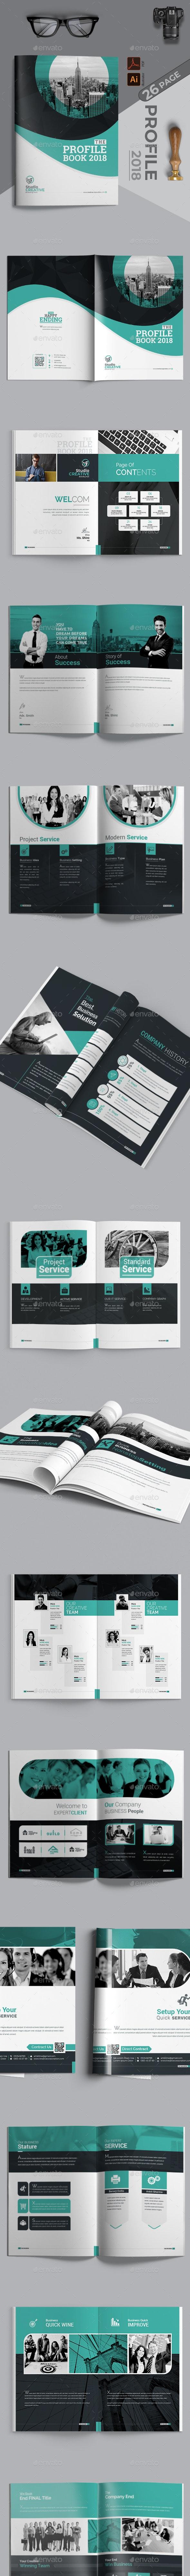 Profile Book - Magazines Print Templates